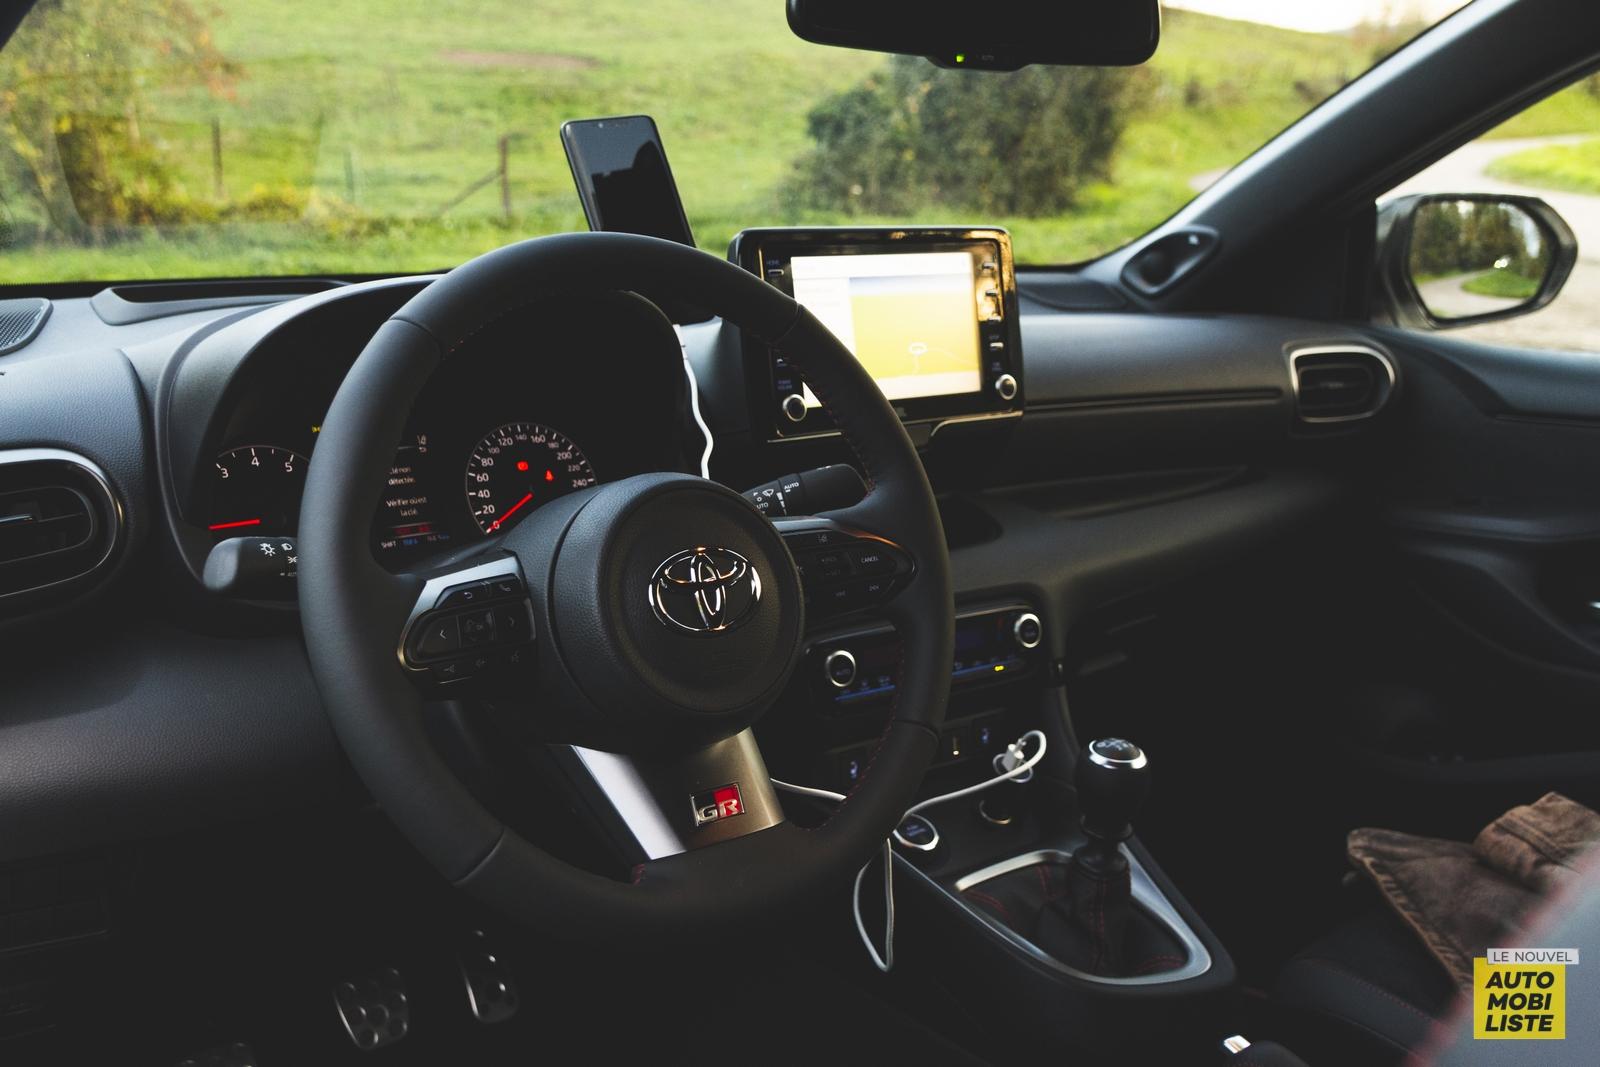 Essai Toyota Yaris GR LeNouvelAutomobiliste 77